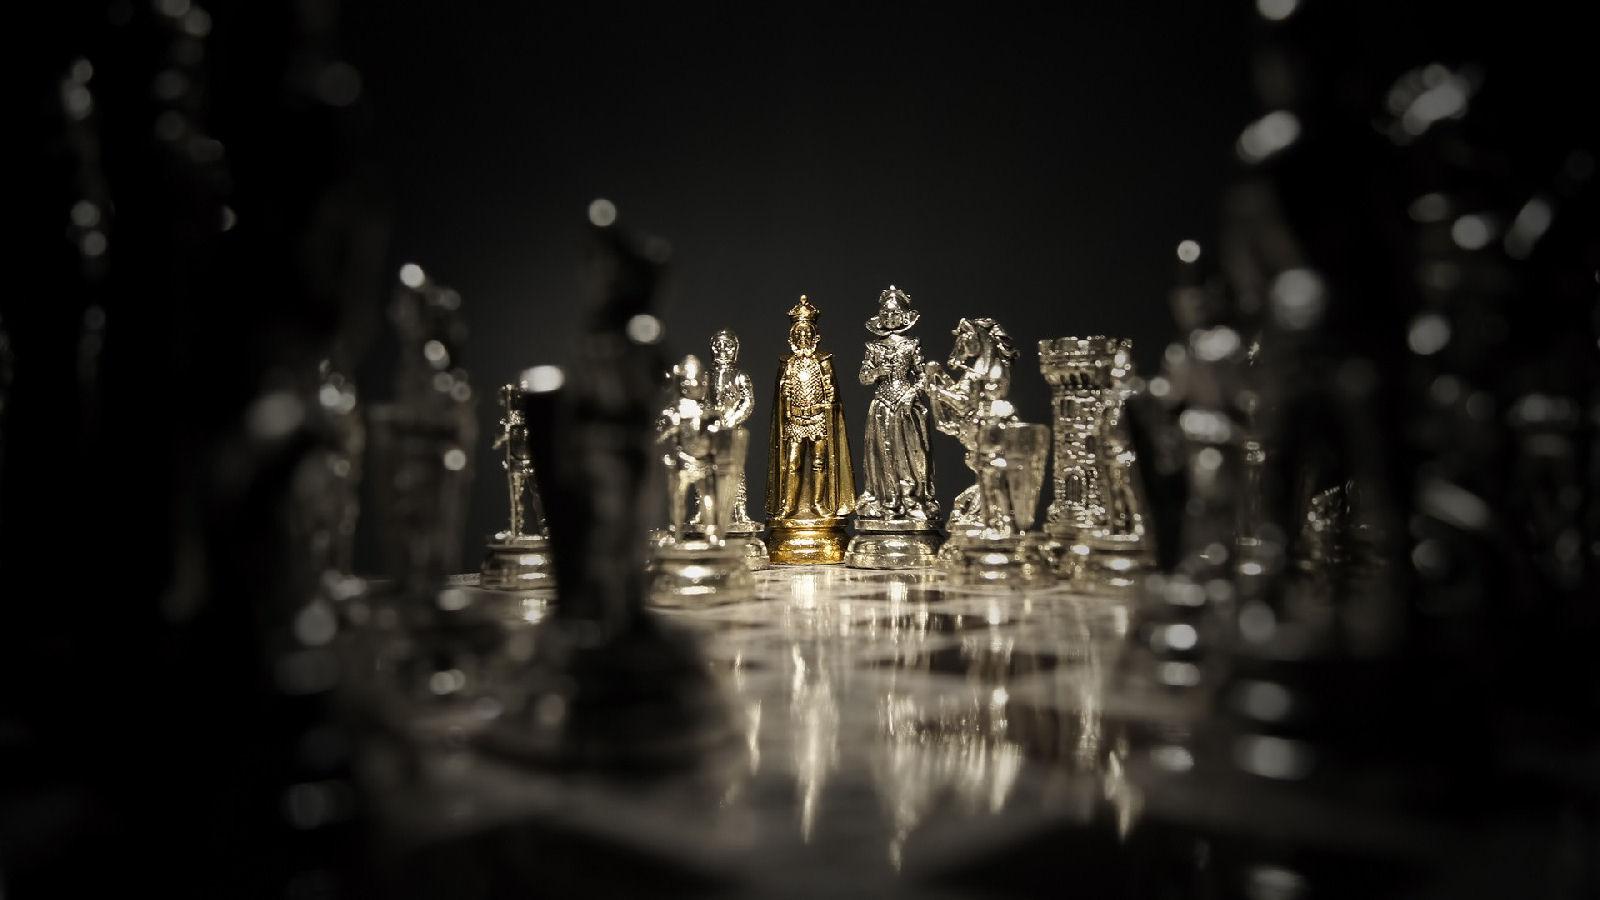 Wallpaper Chess Gamer King Queen 1600x900 Kmaco 1205732